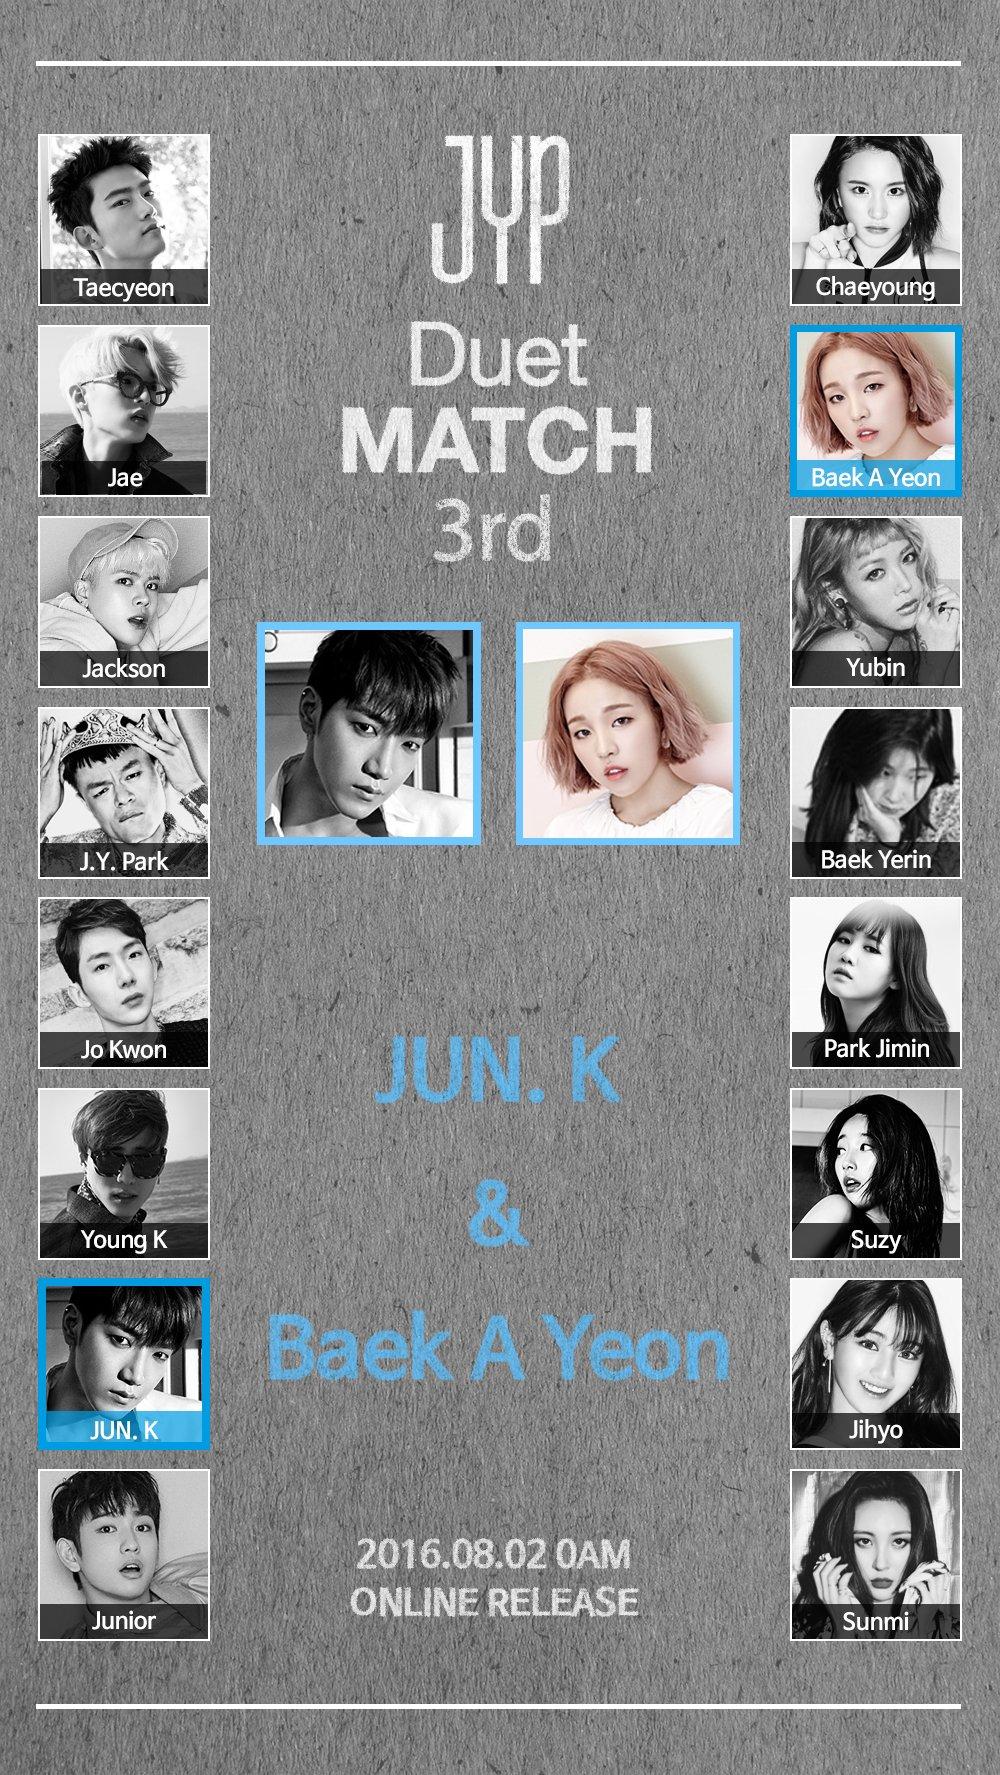 Update: JYP Entertainment Announces Jun.K Will Join Baek A Yeon For Upcoming Duet